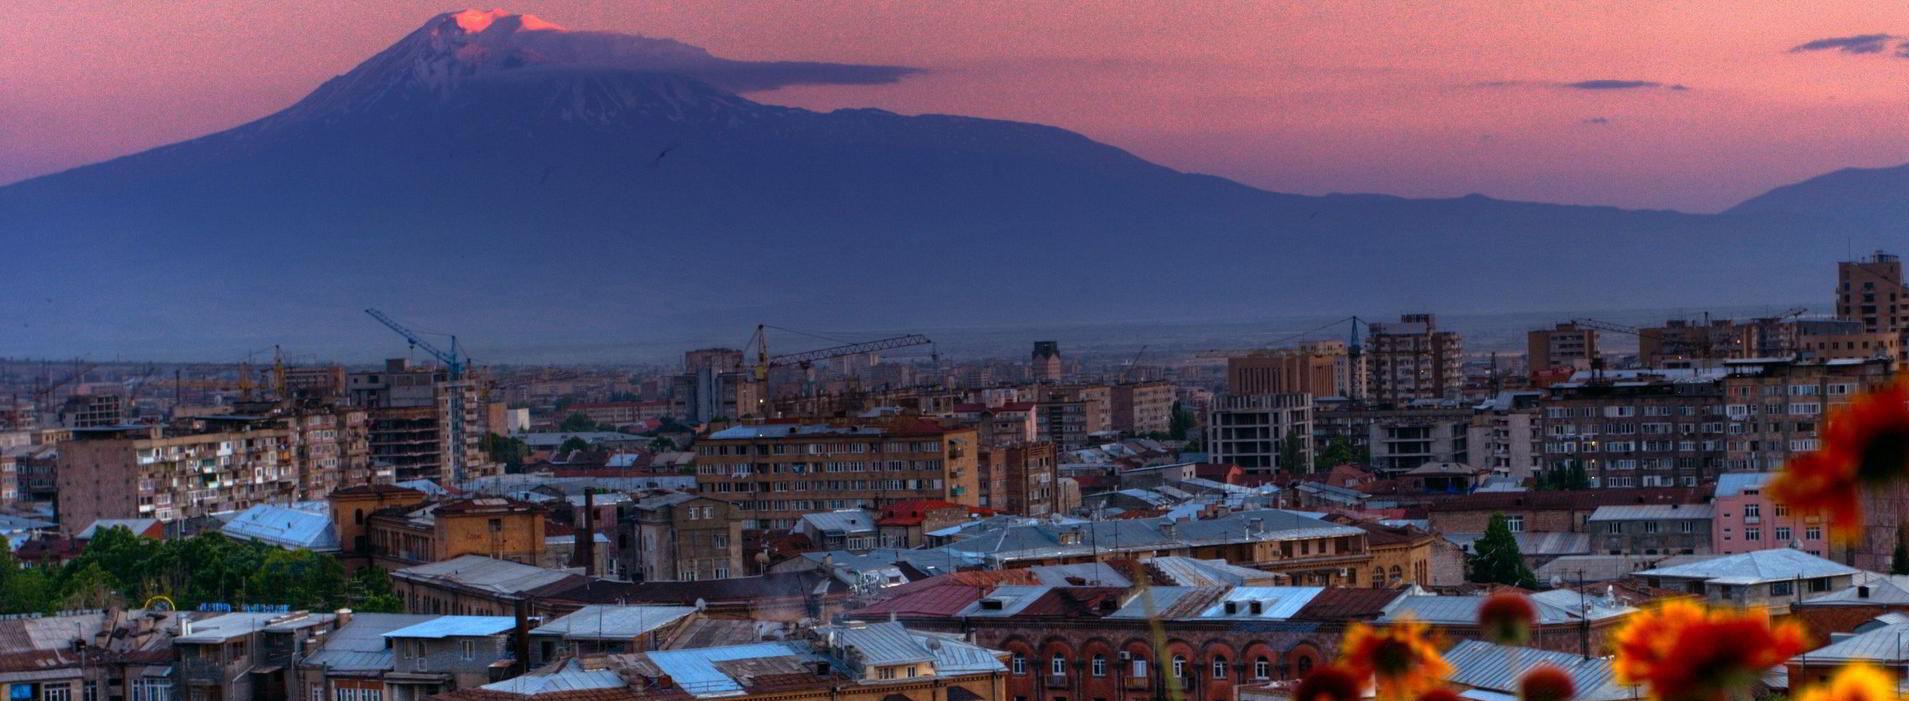 Фото Еревана вечером